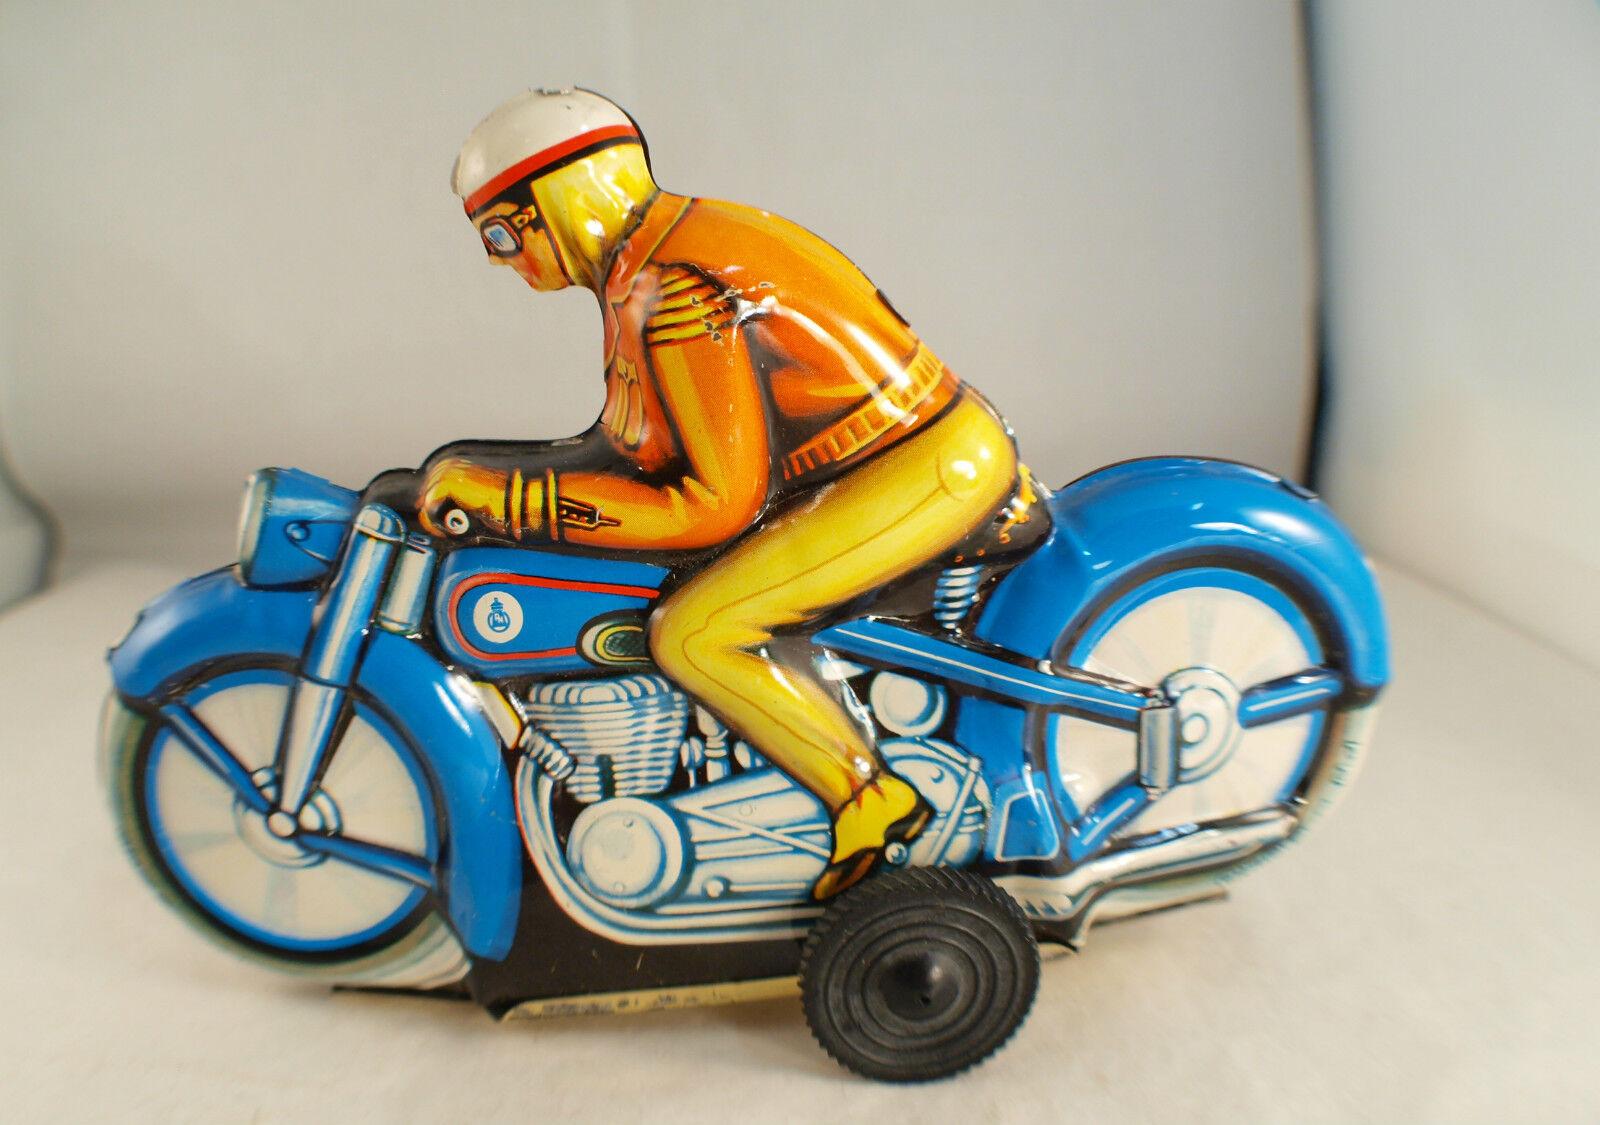 Pn Western Germany Moto Latta Litografata Antico Frizione 16,5 cm Tintoy